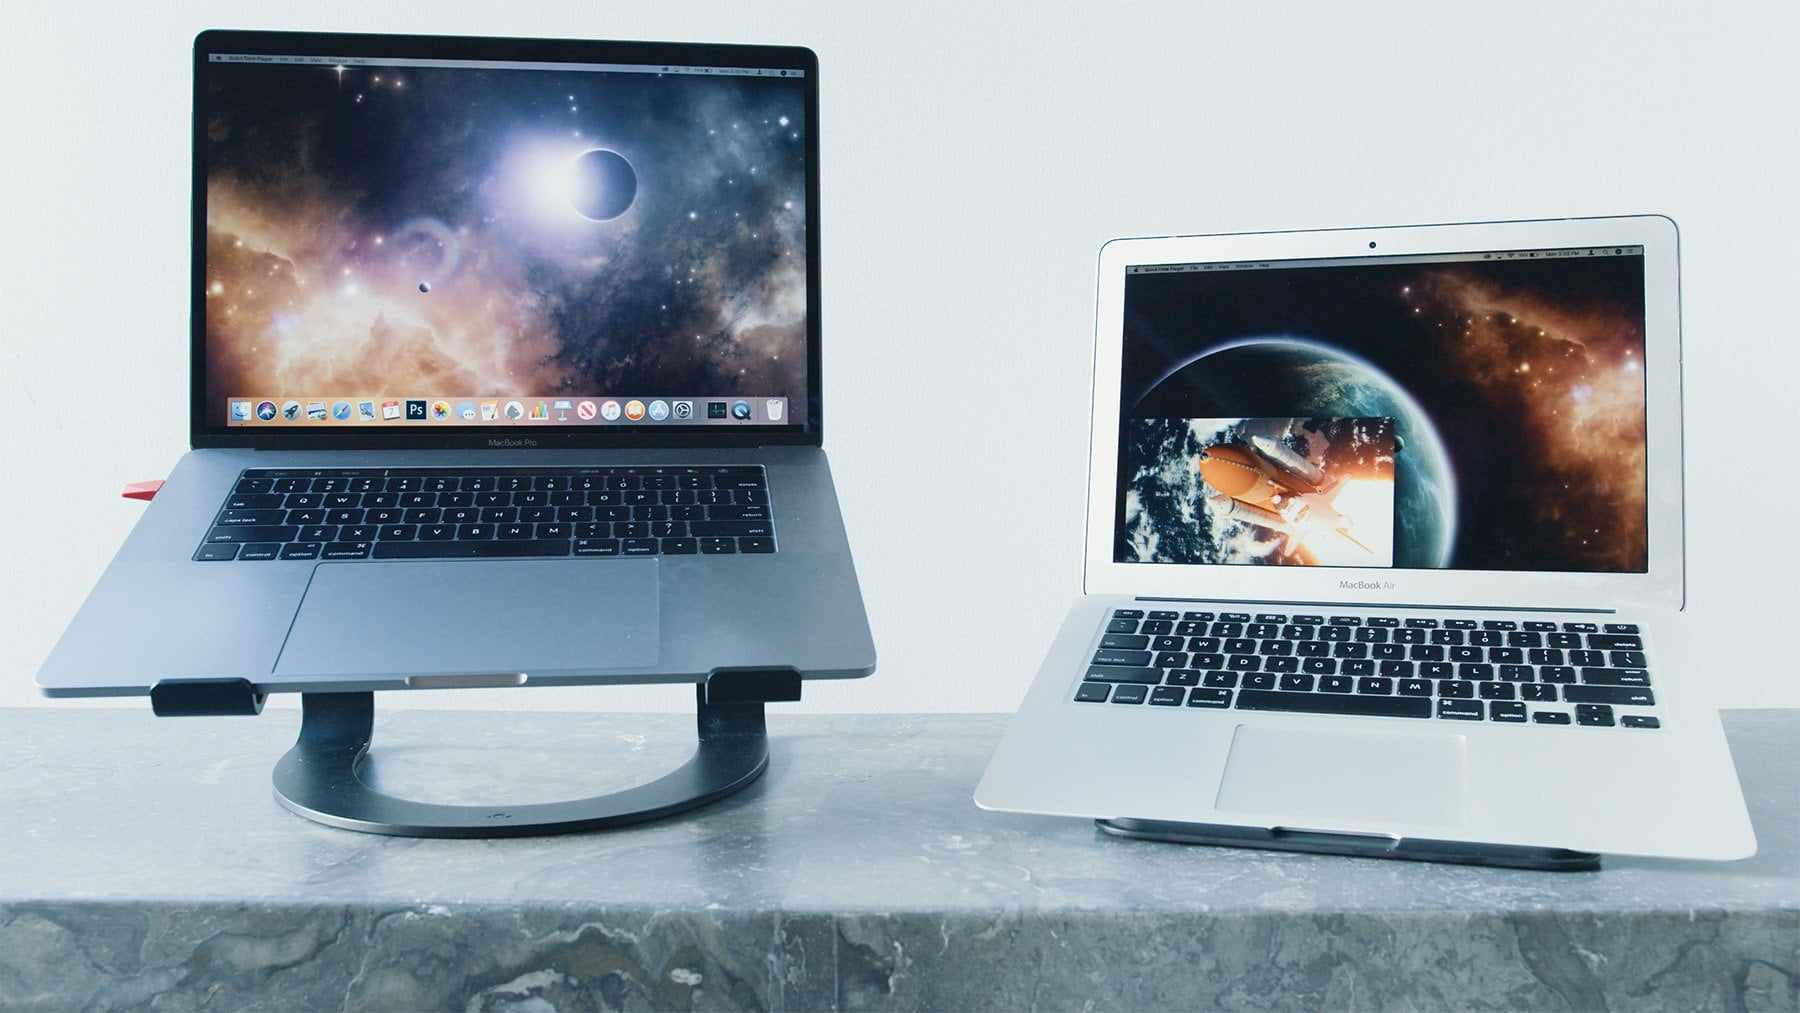 old mac as second display